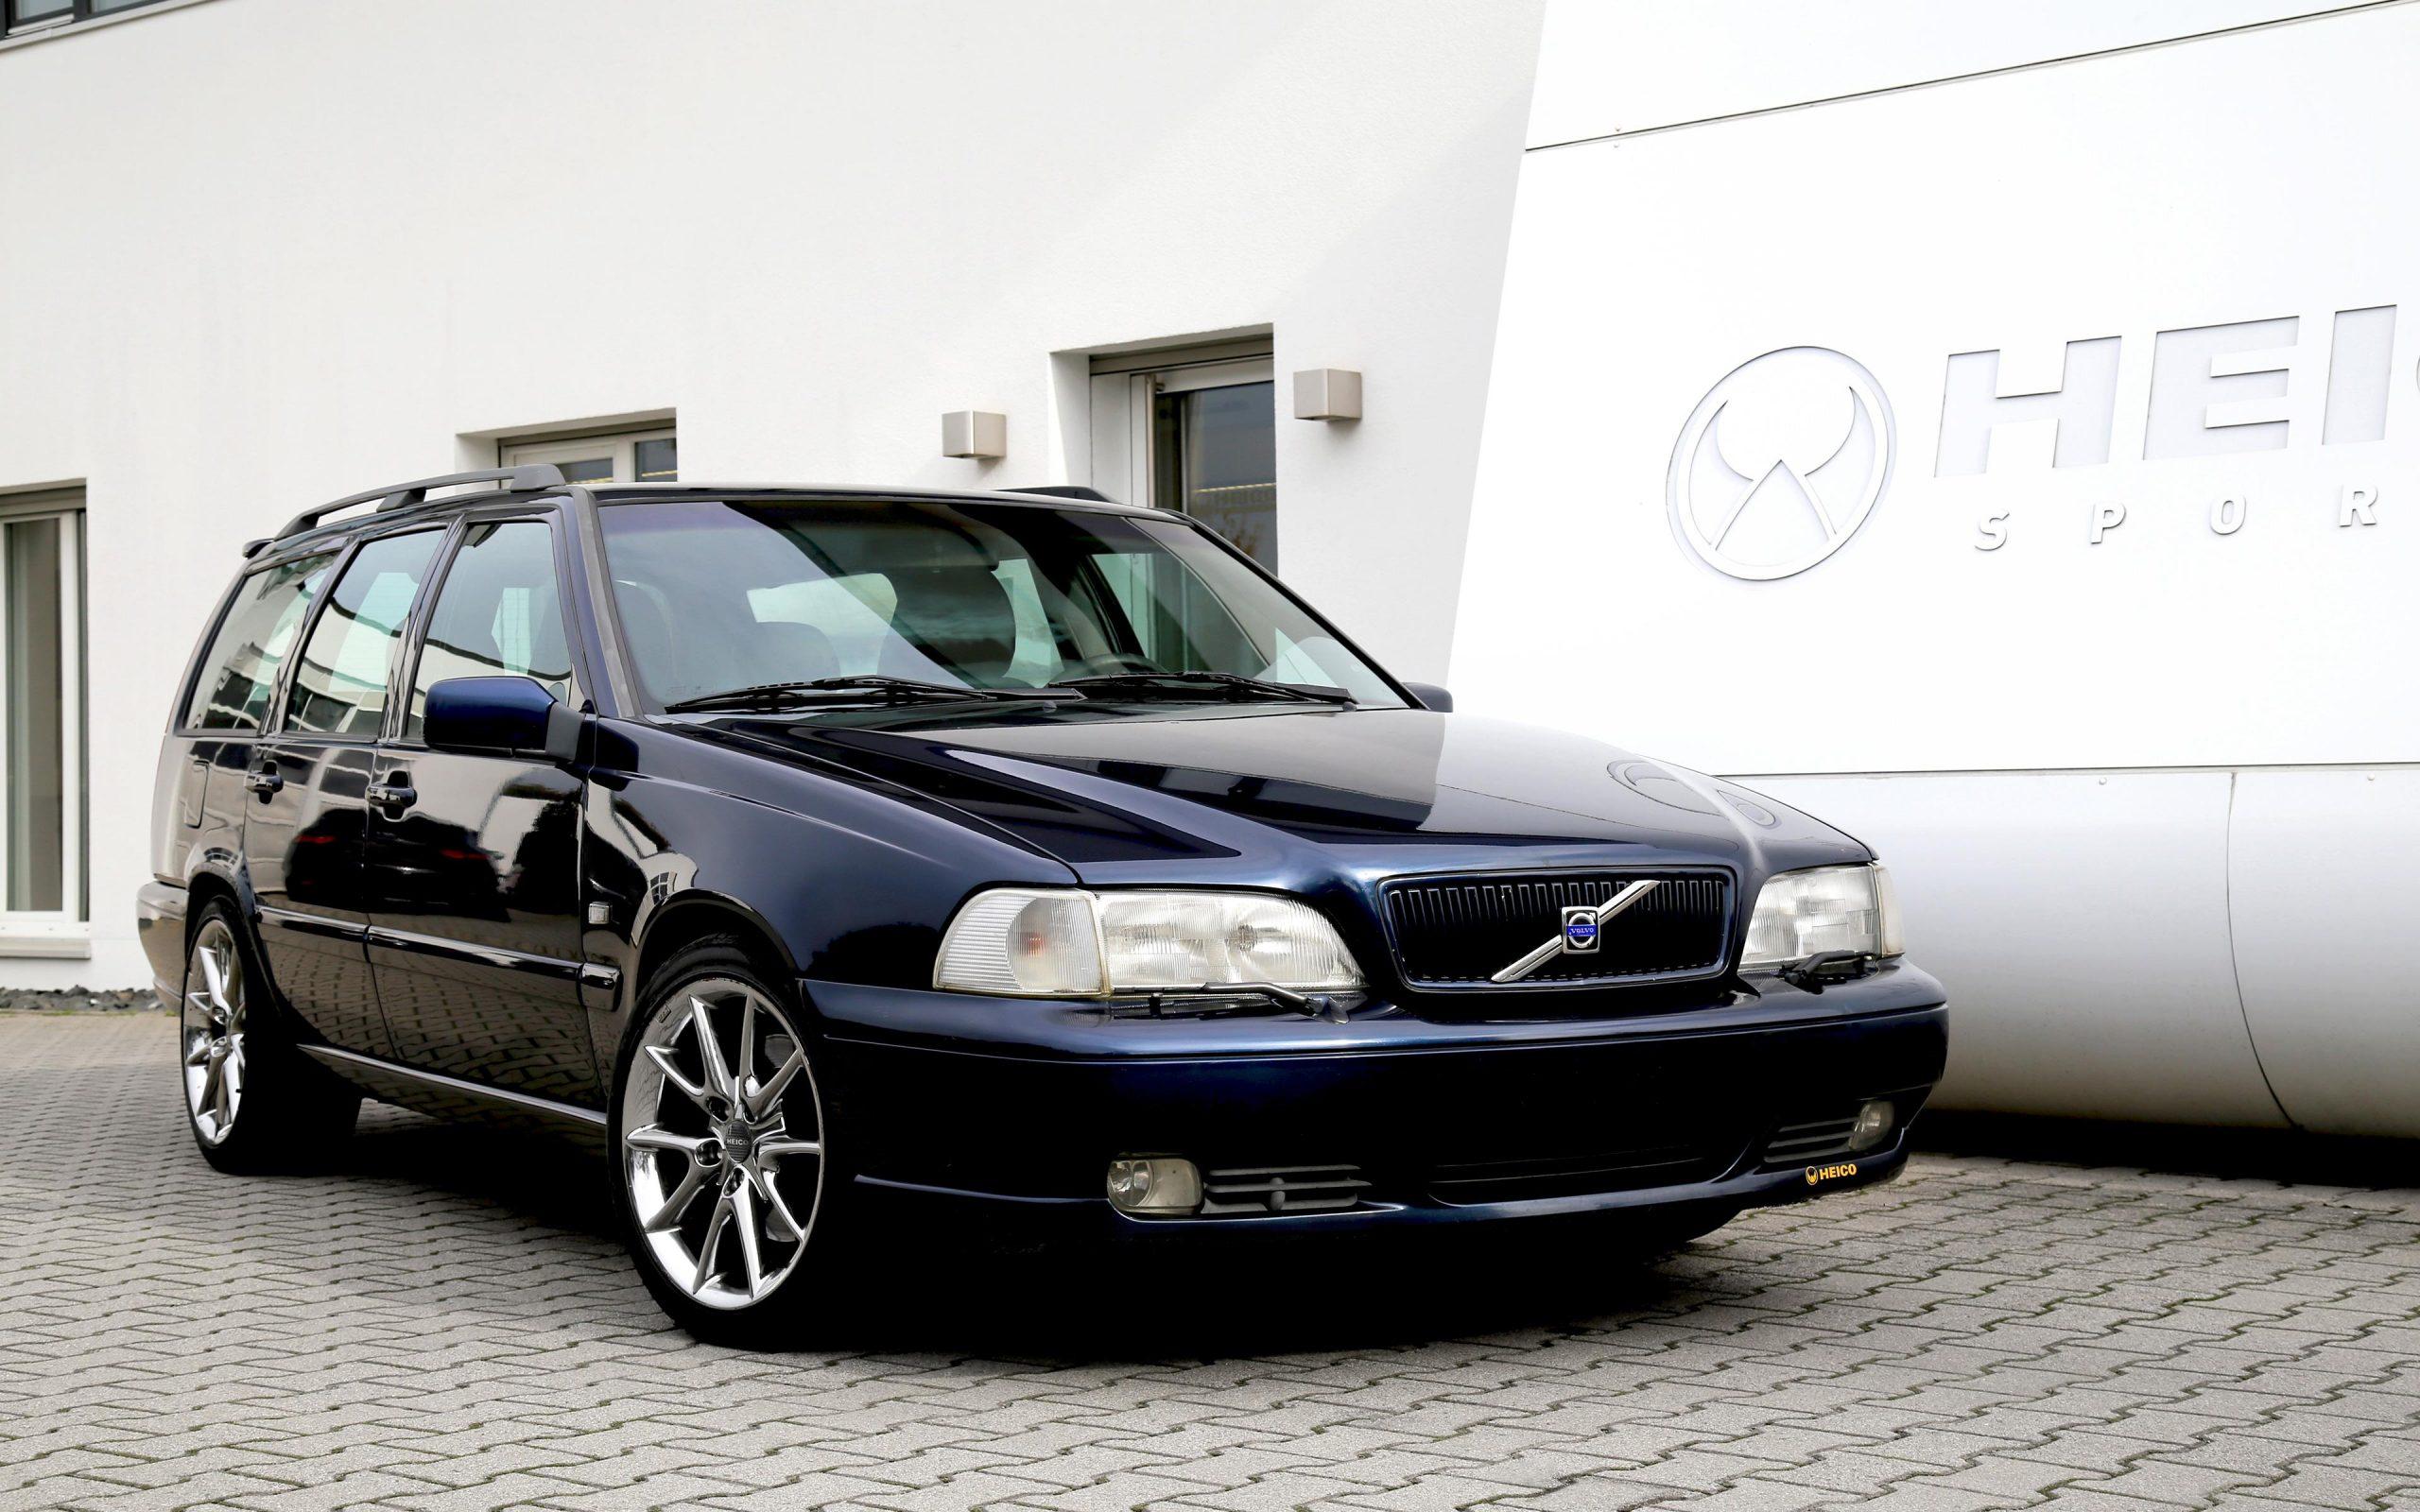 heico-sportiv-V70-edition-front-2